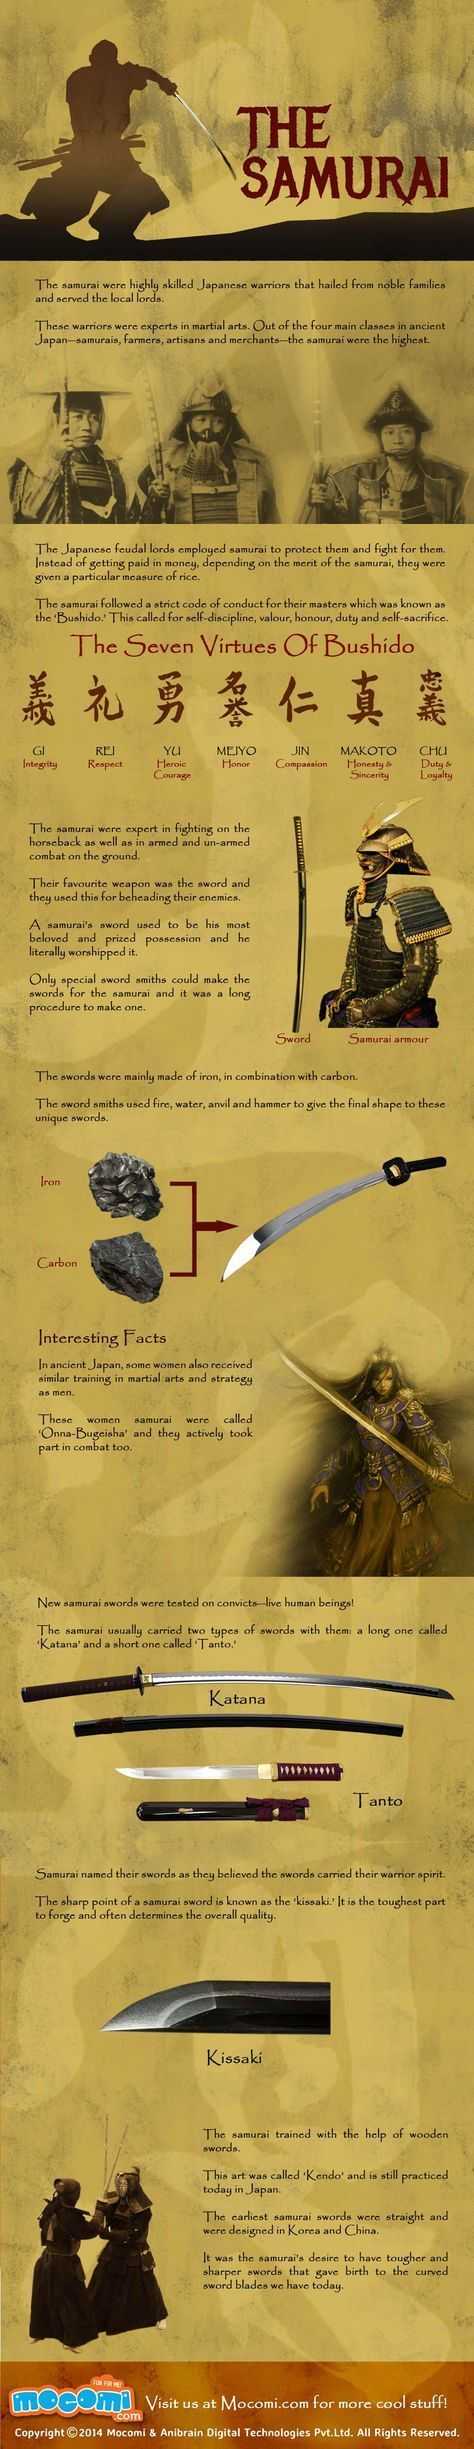 Brief History of Samurai Warriors [Infographic]